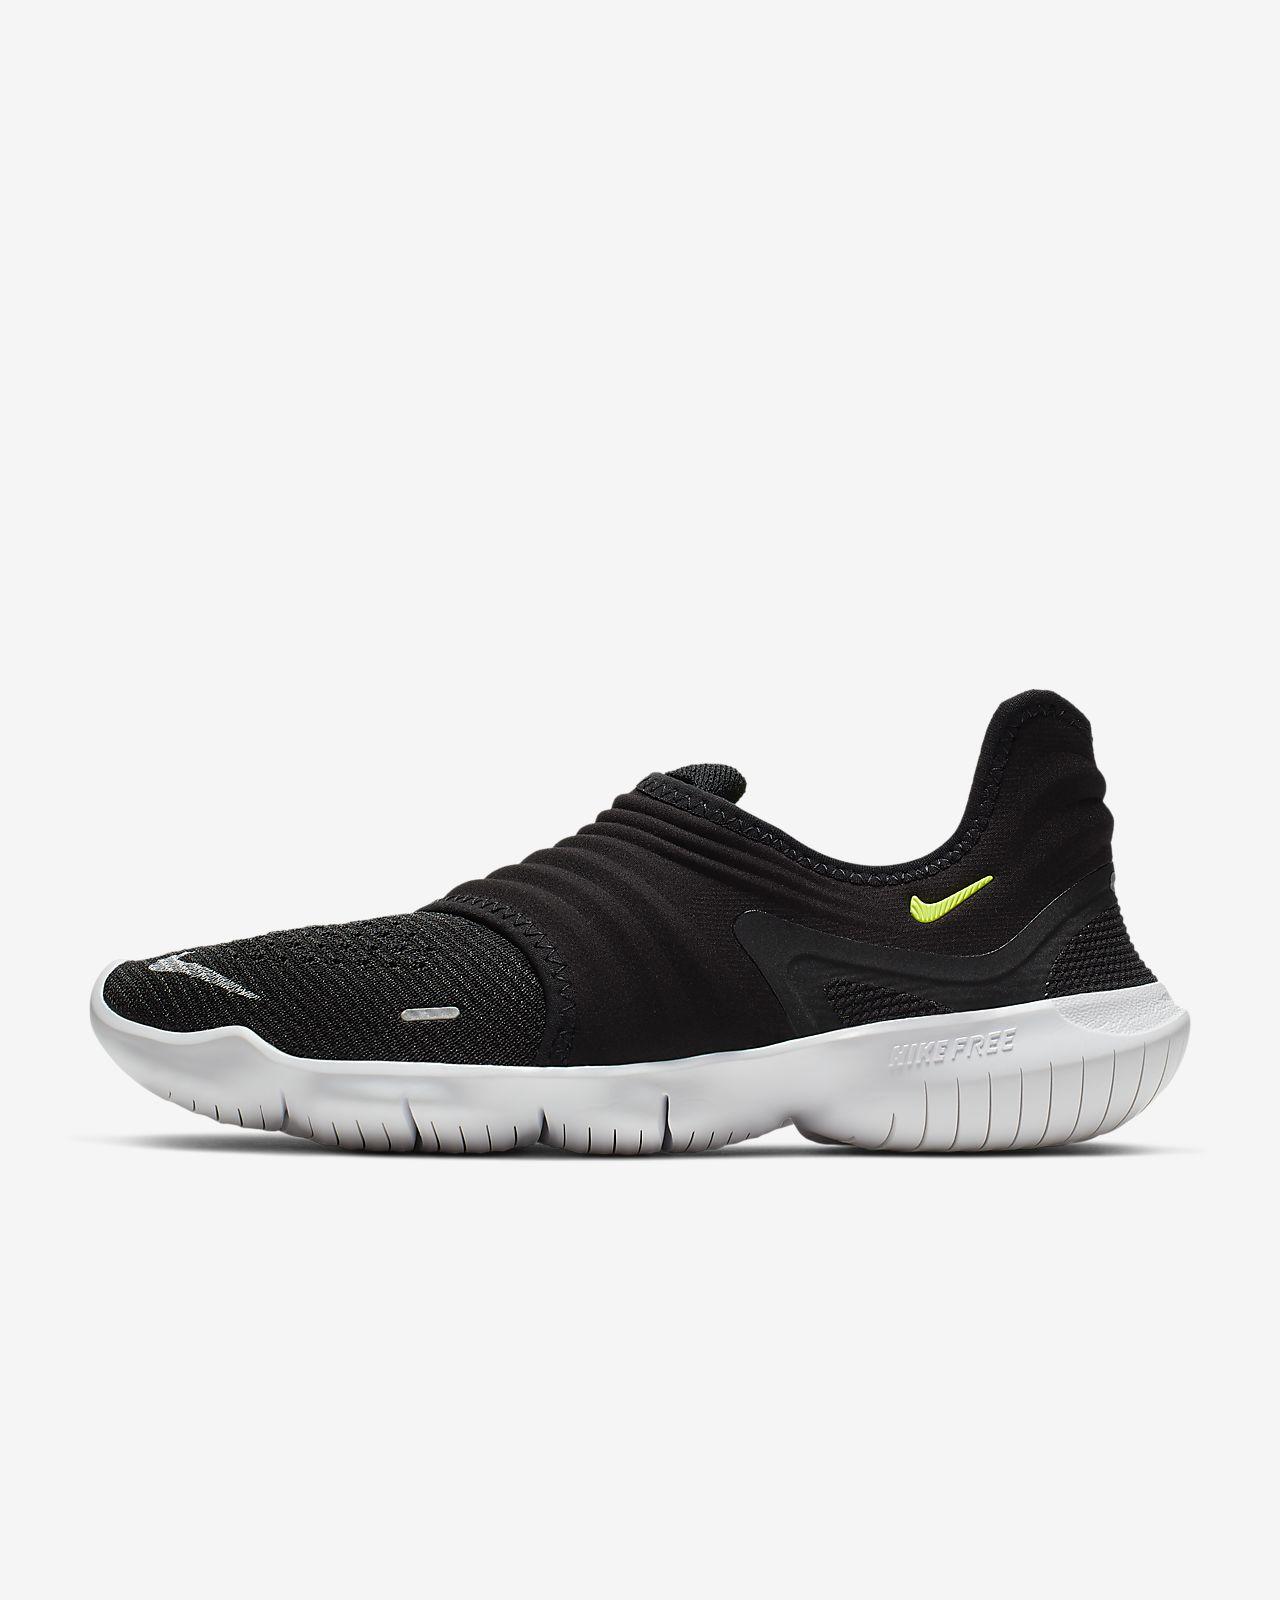 designer fashion d5d4e 570c0 ... Nike Free RN Flyknit 3.0 Damen-Laufschuh